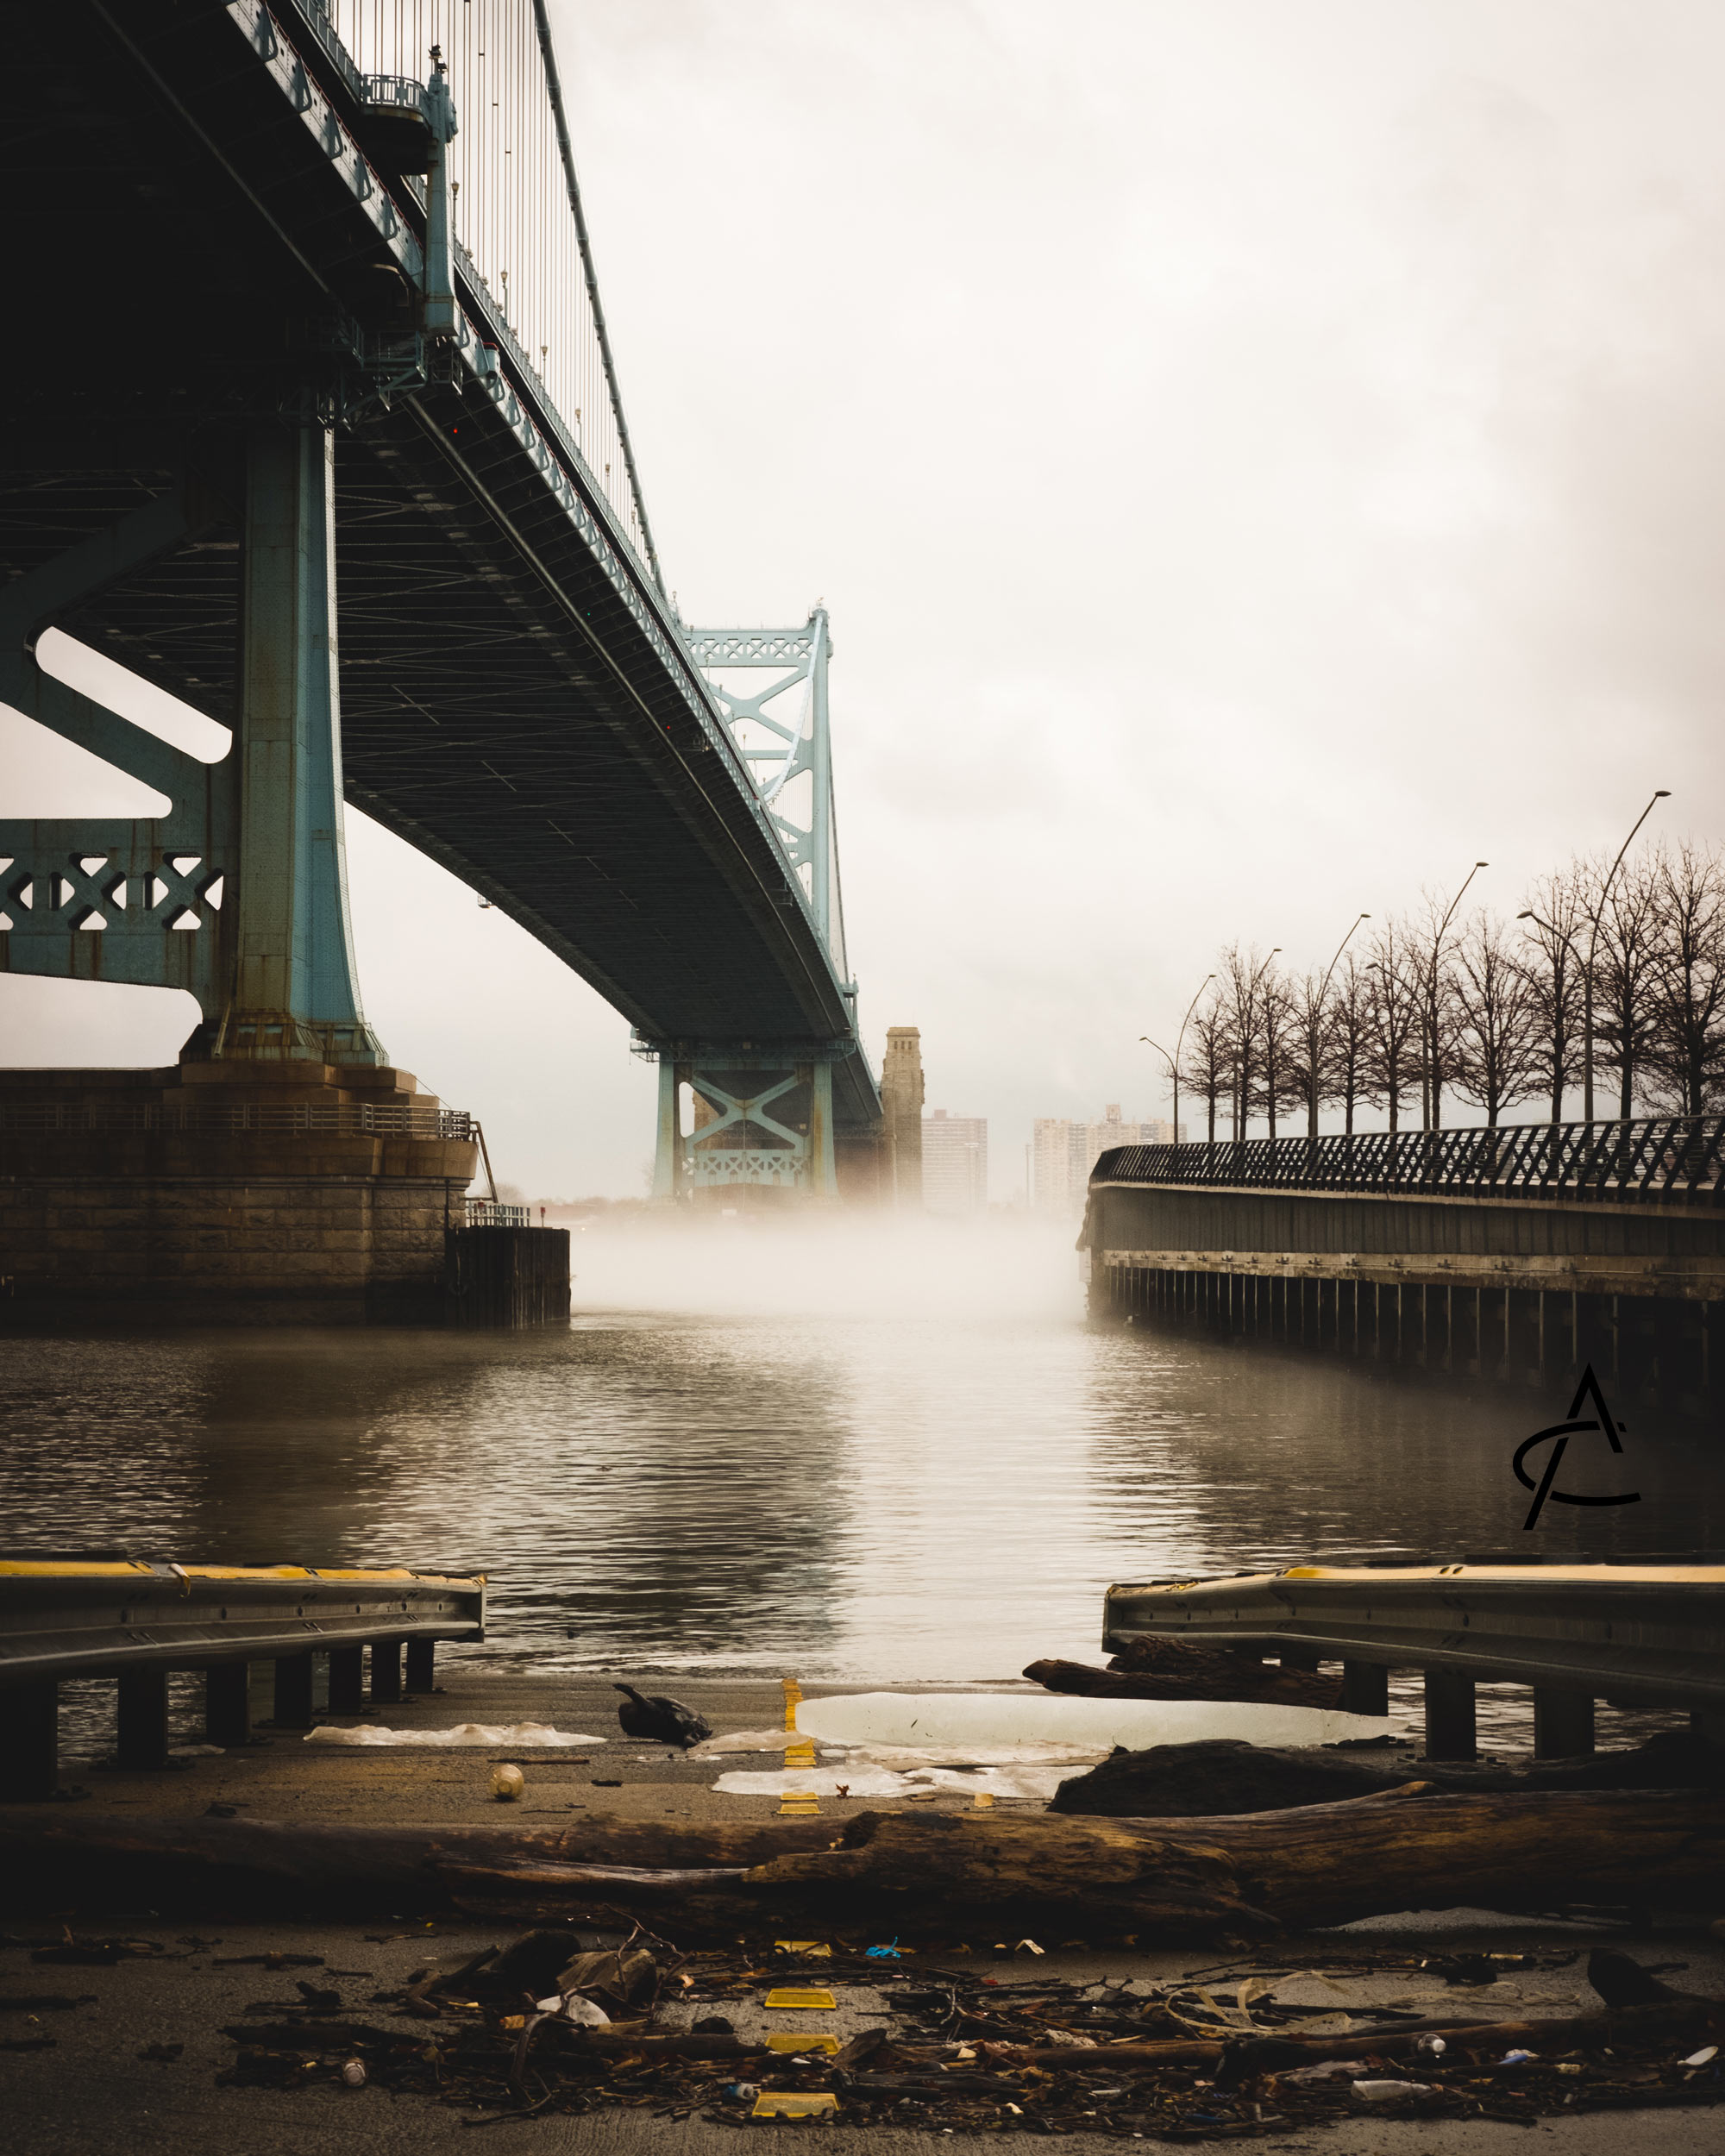 Philly_1_23_18_05.jpg